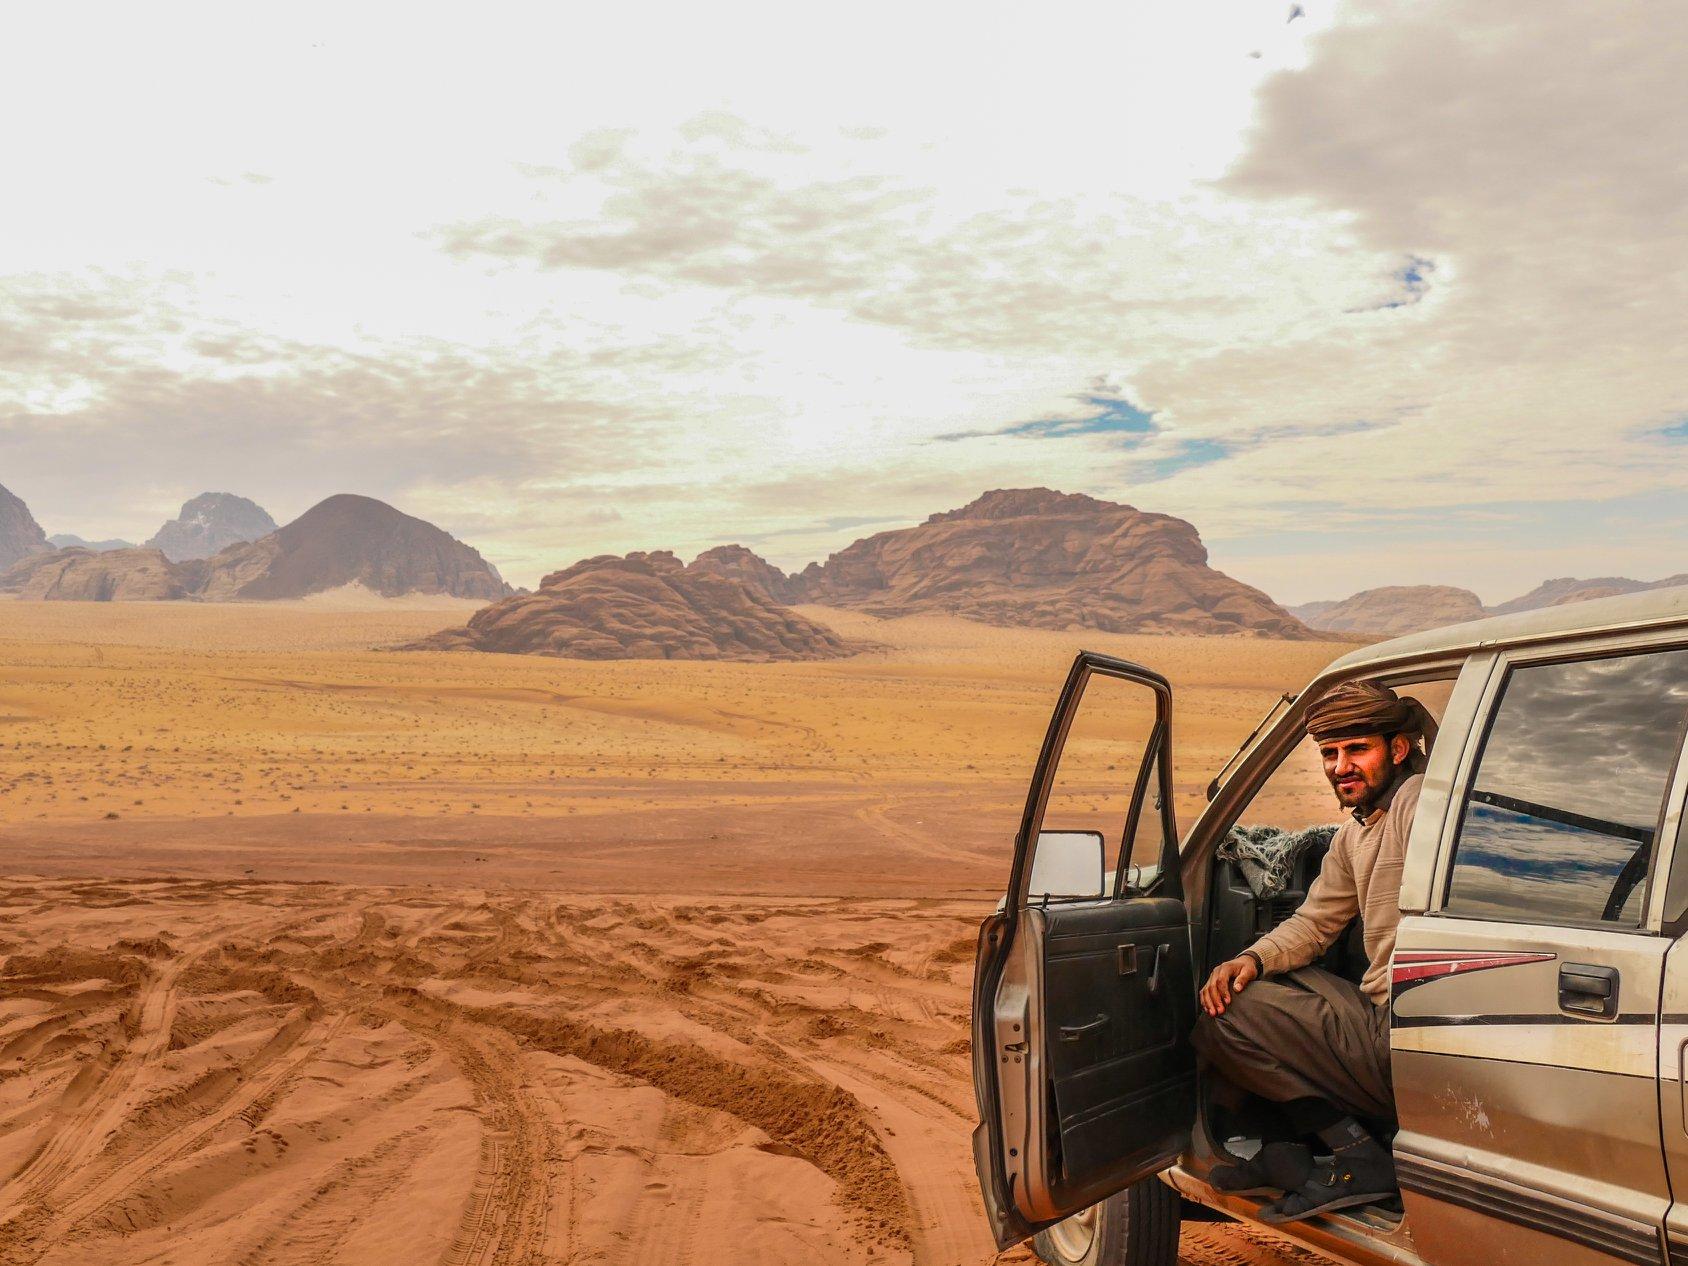 Best thing to do in wadi Rum